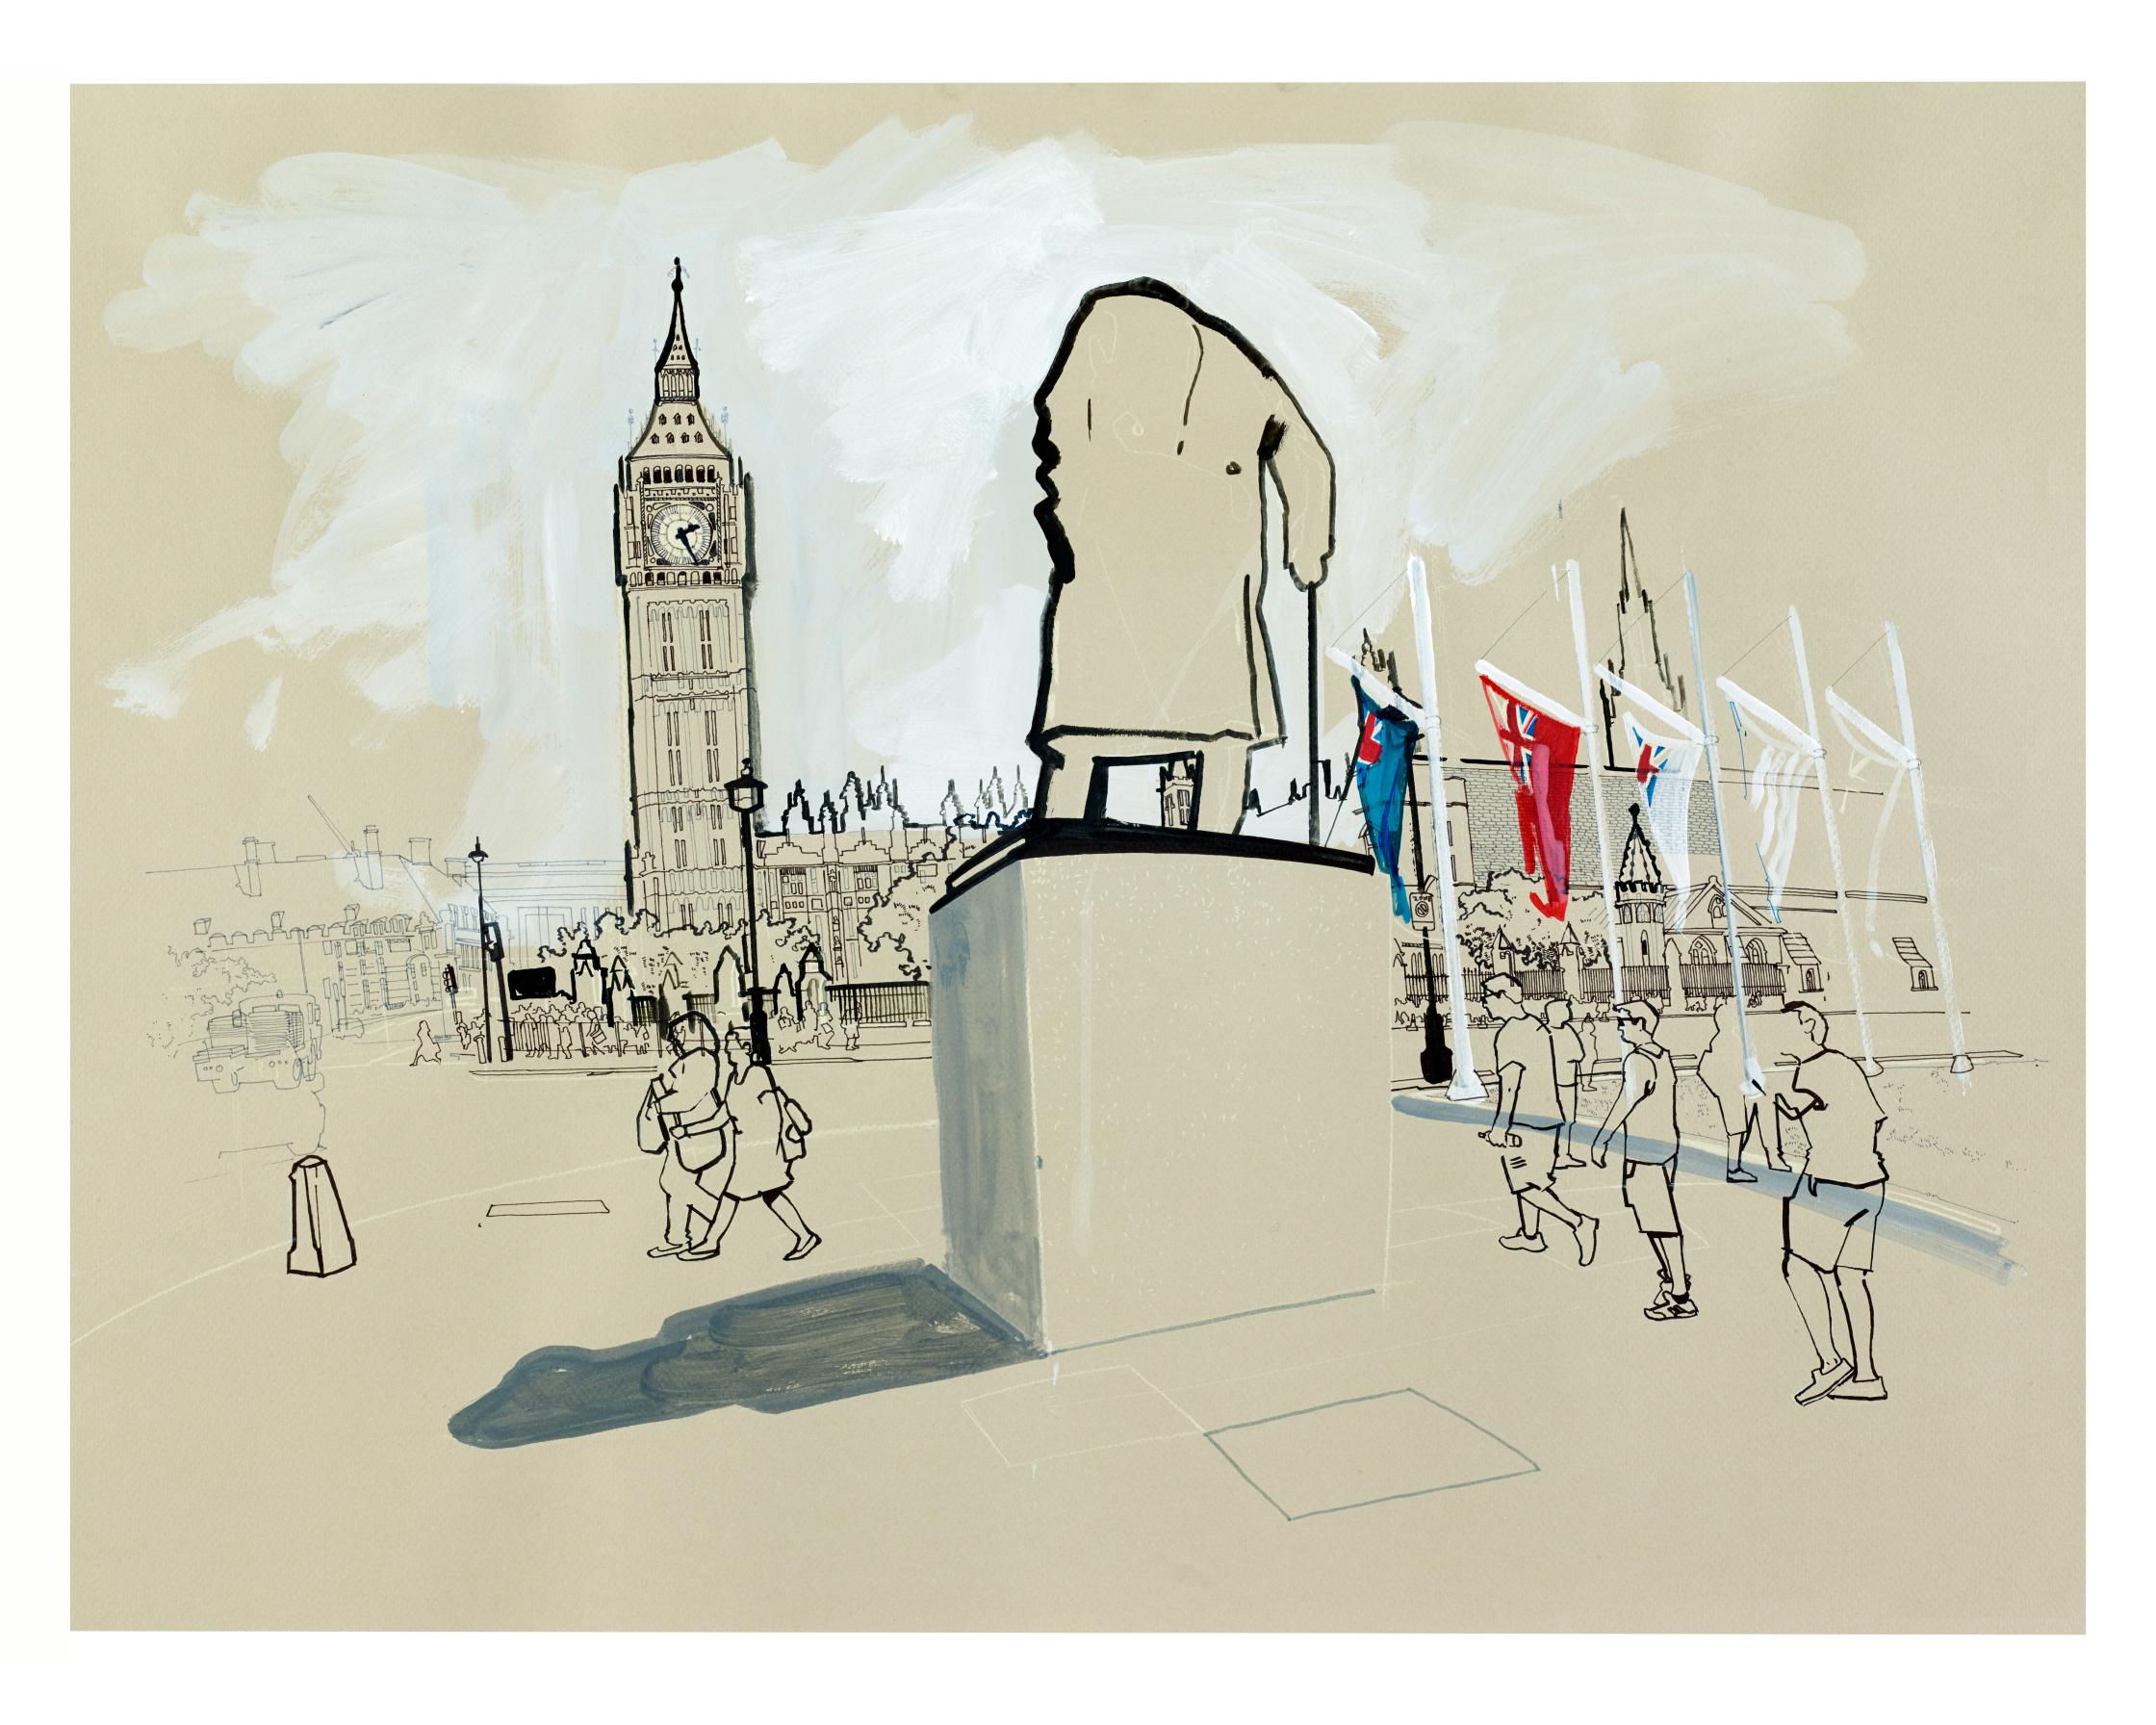 Picture 1-Parliament Square.jpg